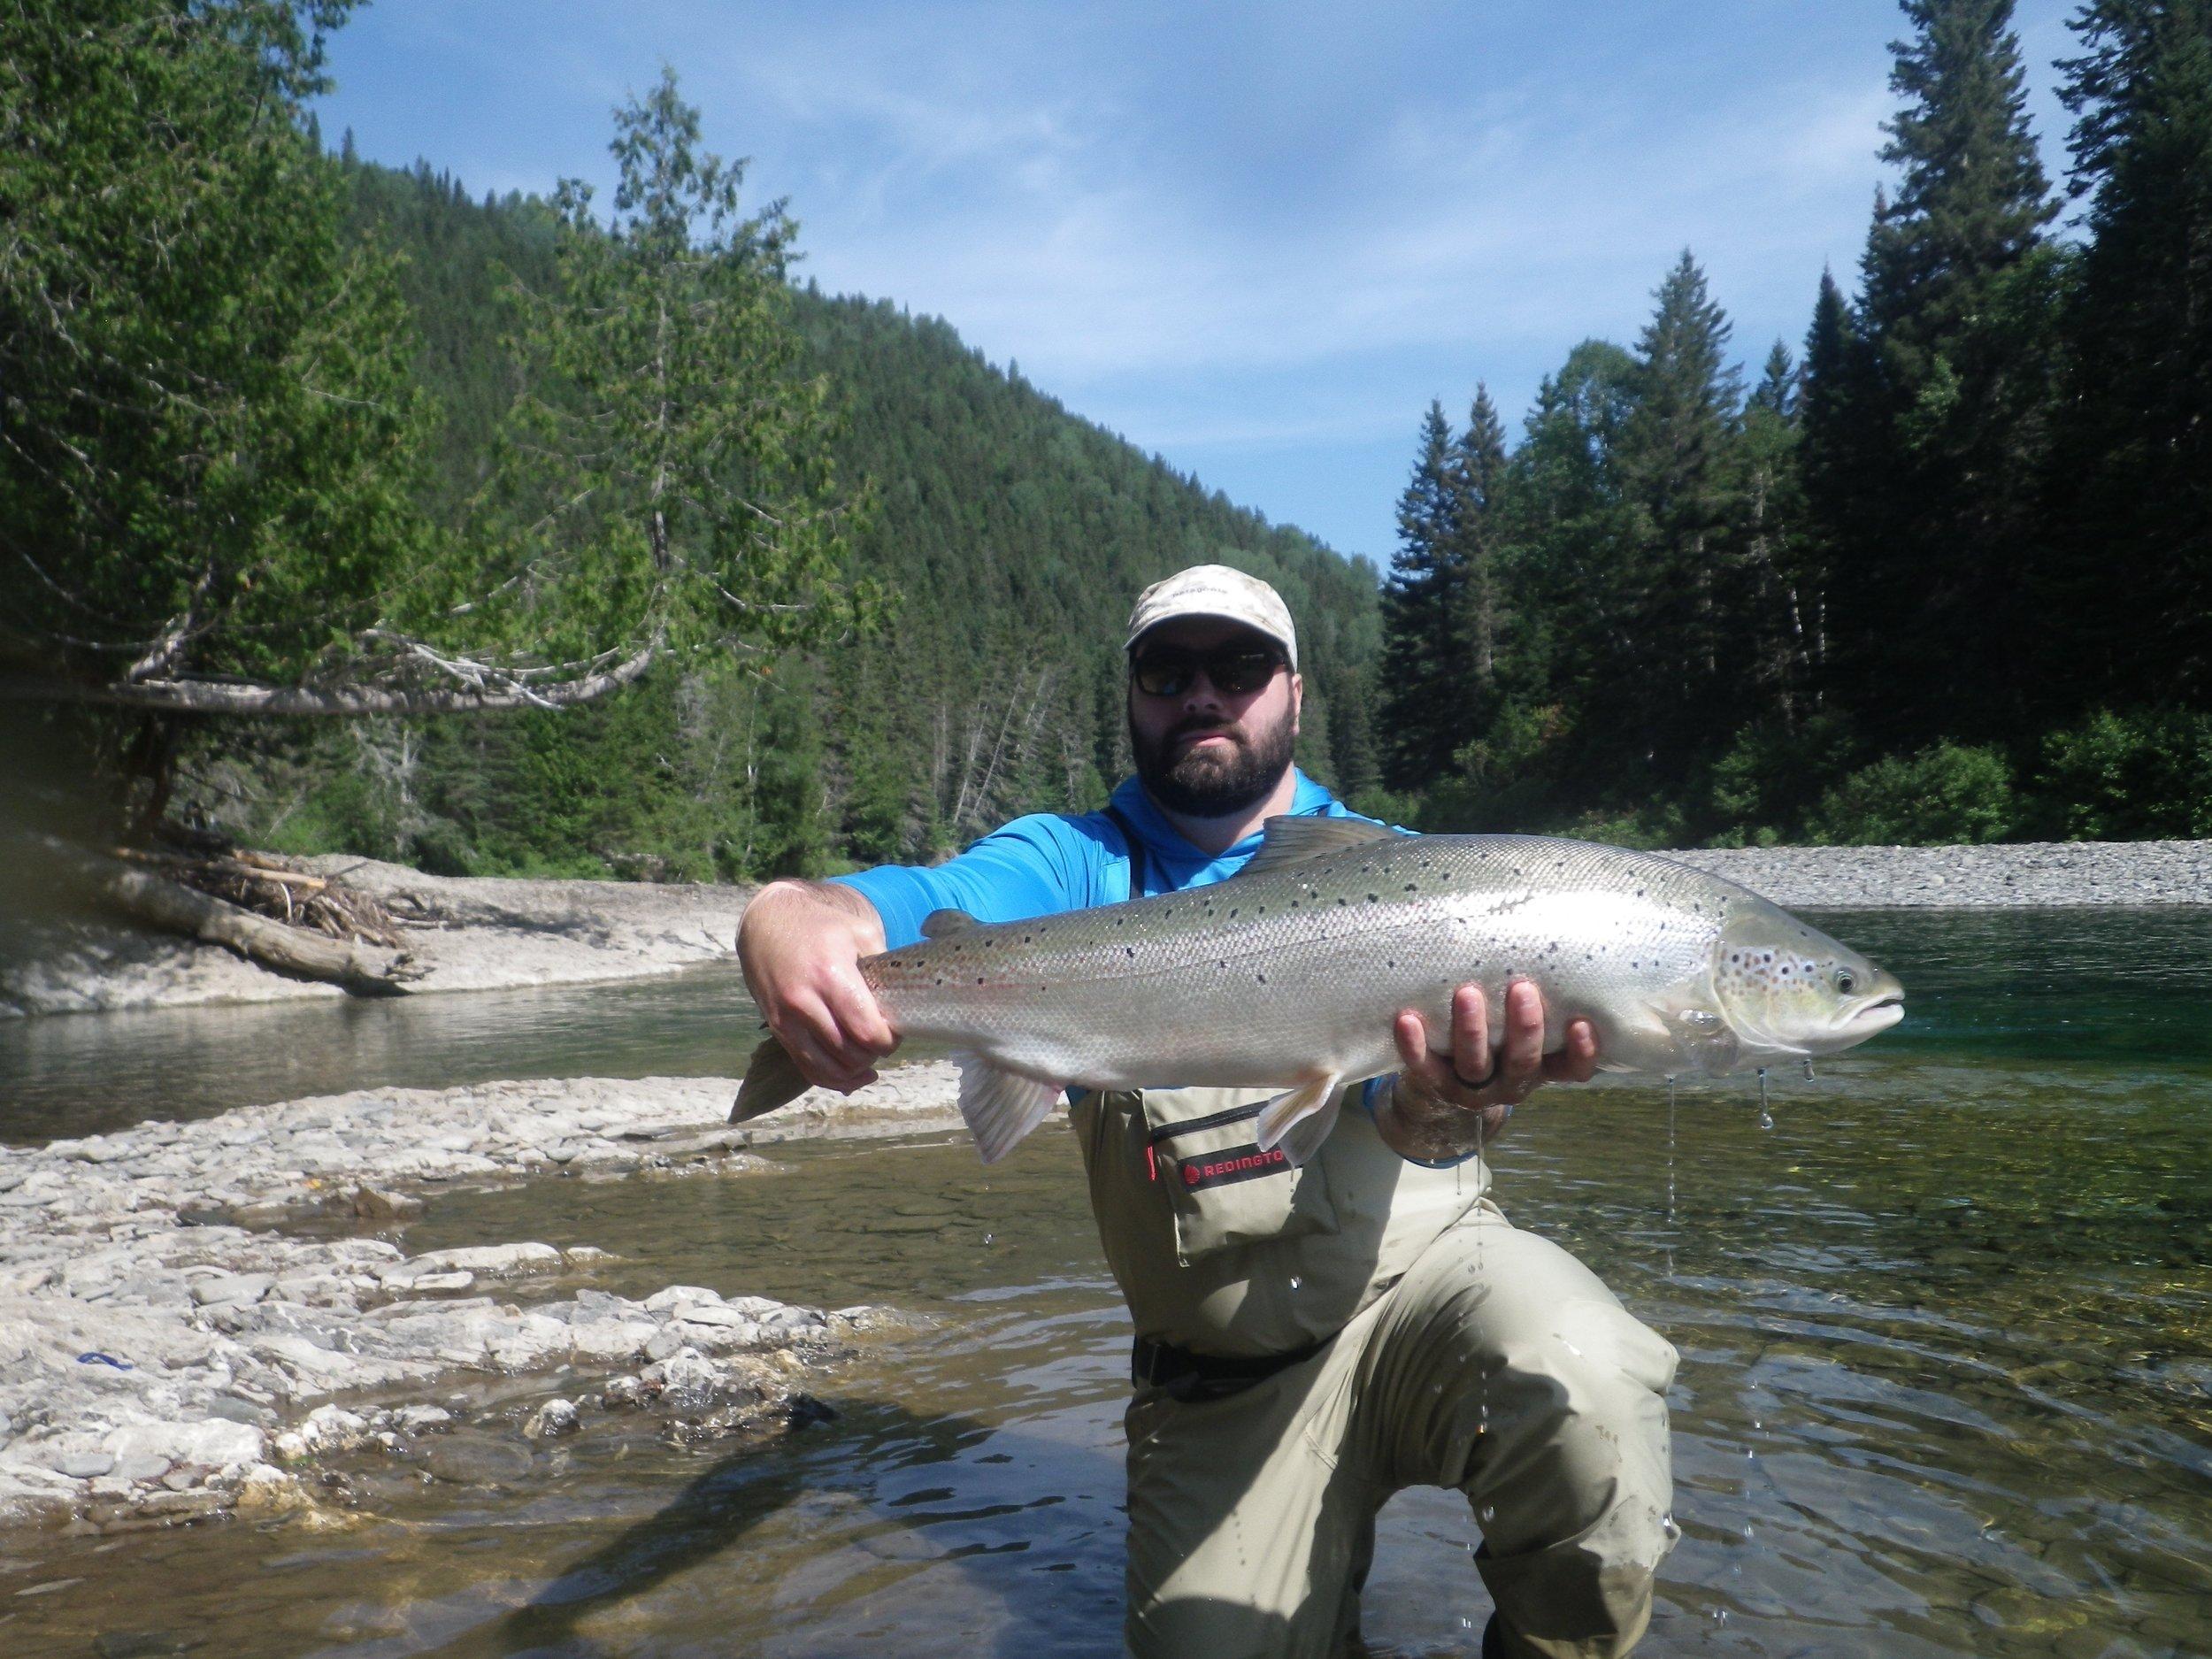 Camp Bonaventure regular Marc Andre Bourdon landed this fine salmon on the Bonaventure, Nicely done Marc Andre!